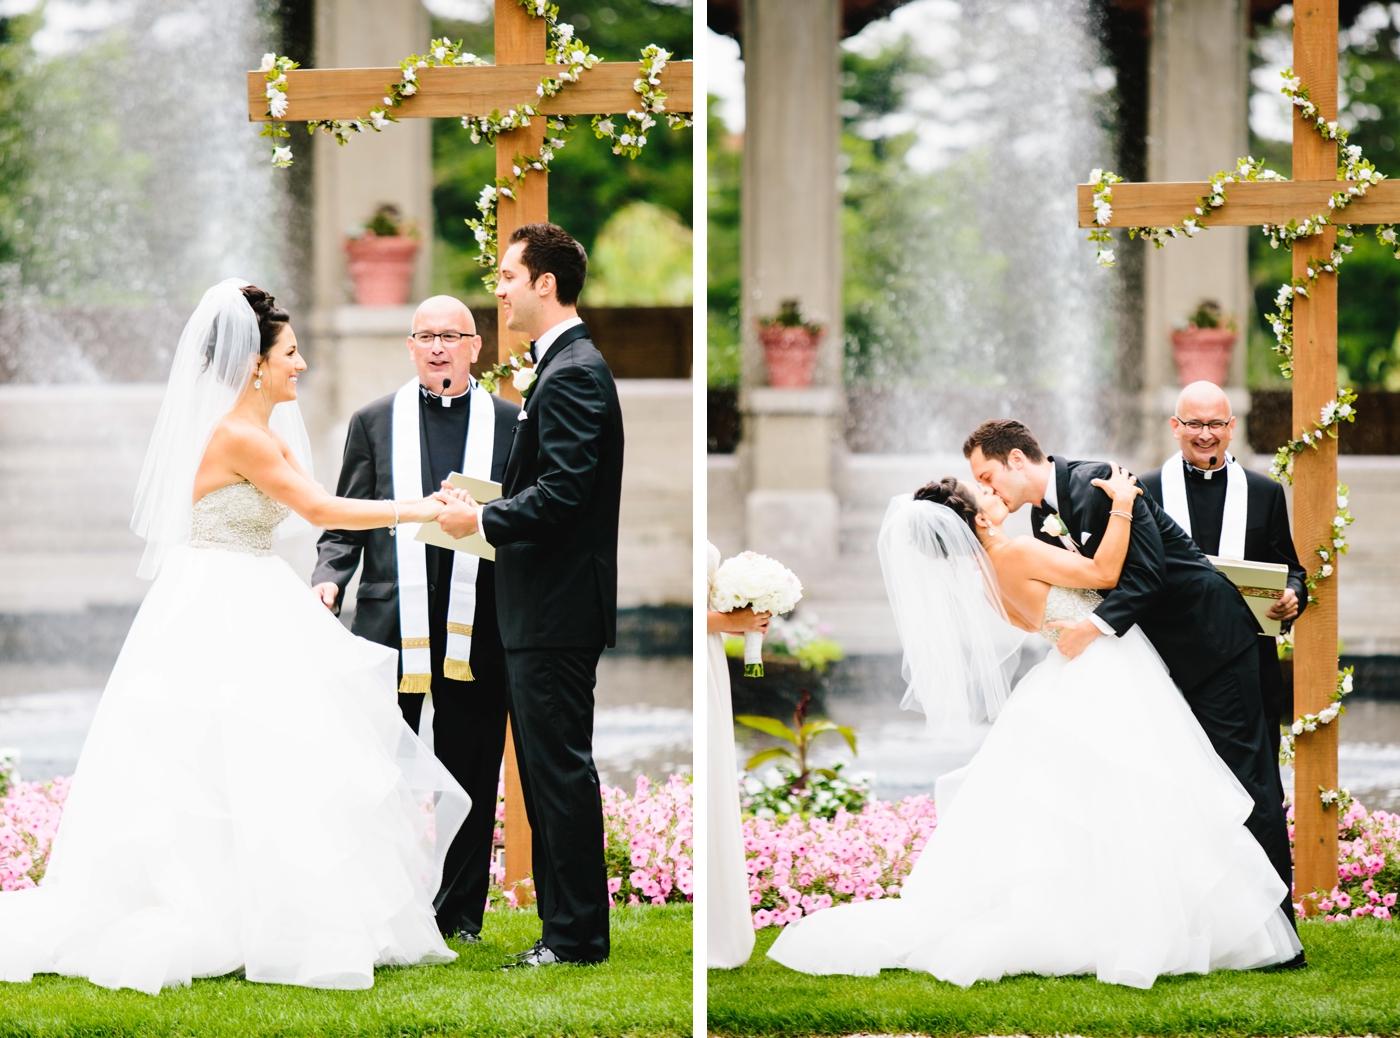 chicago-fine-art-wedding-photography-smeja26